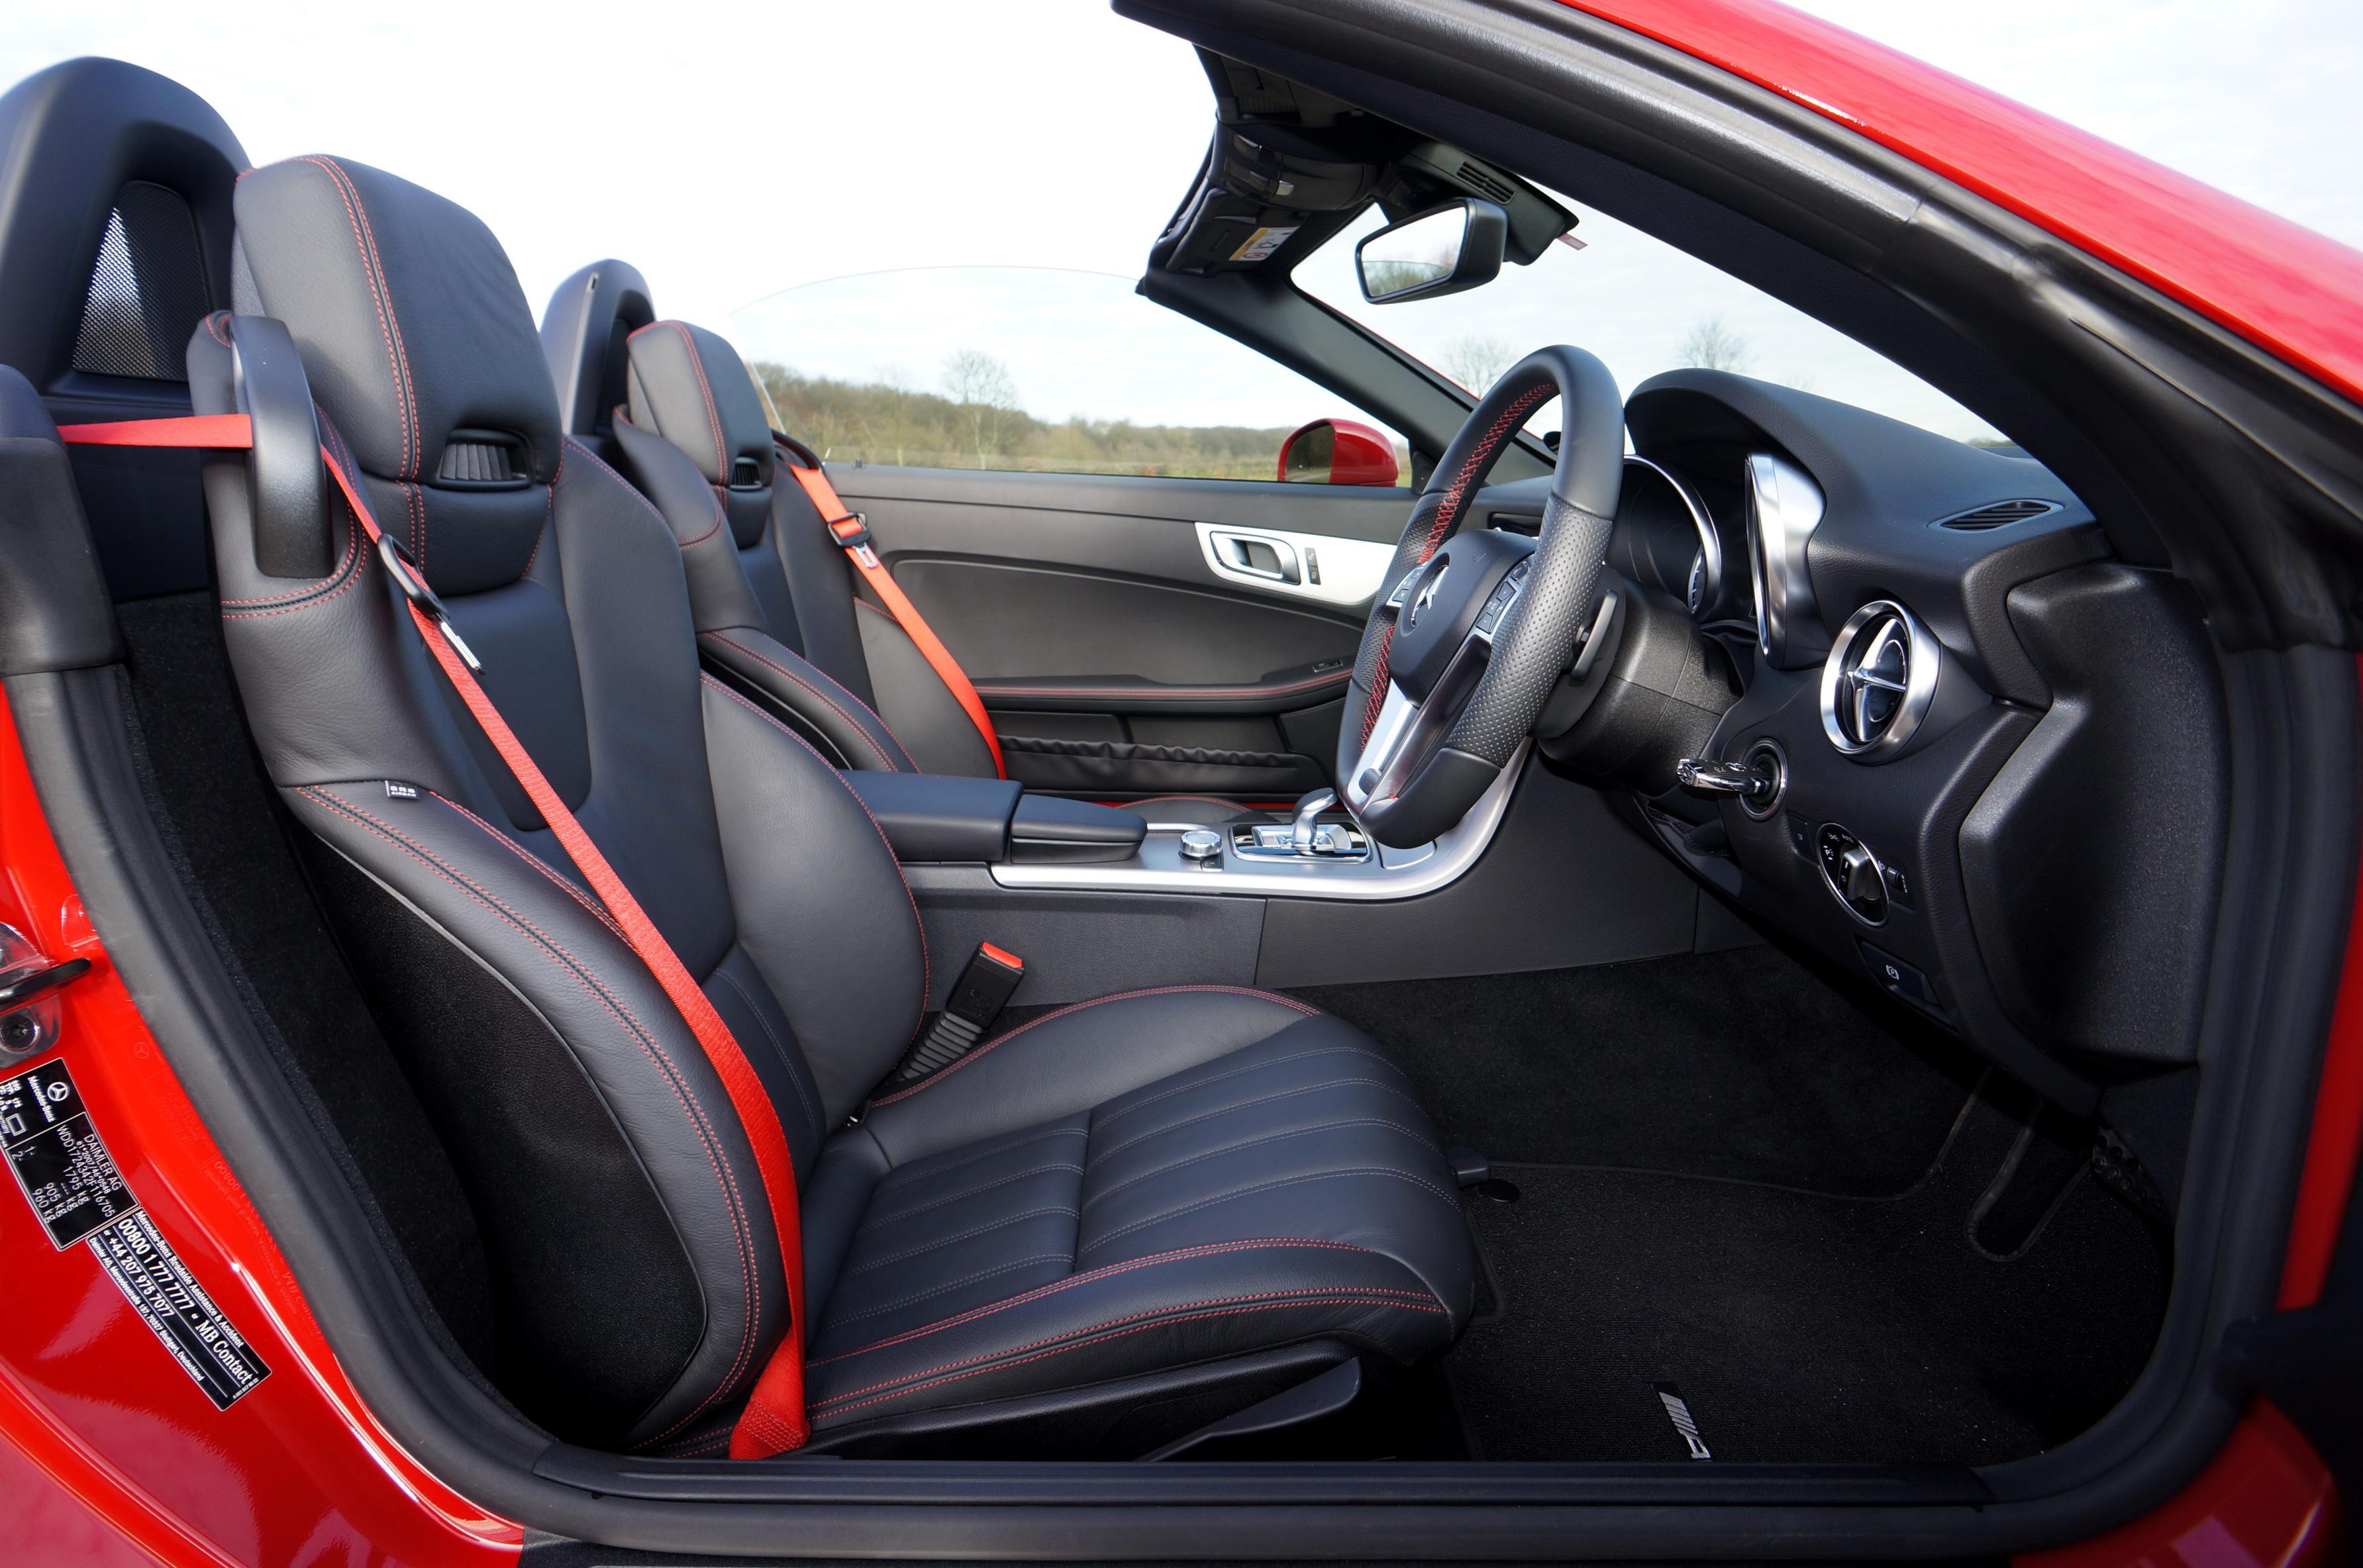 Free Images : technology, seat, interior, transportation ...